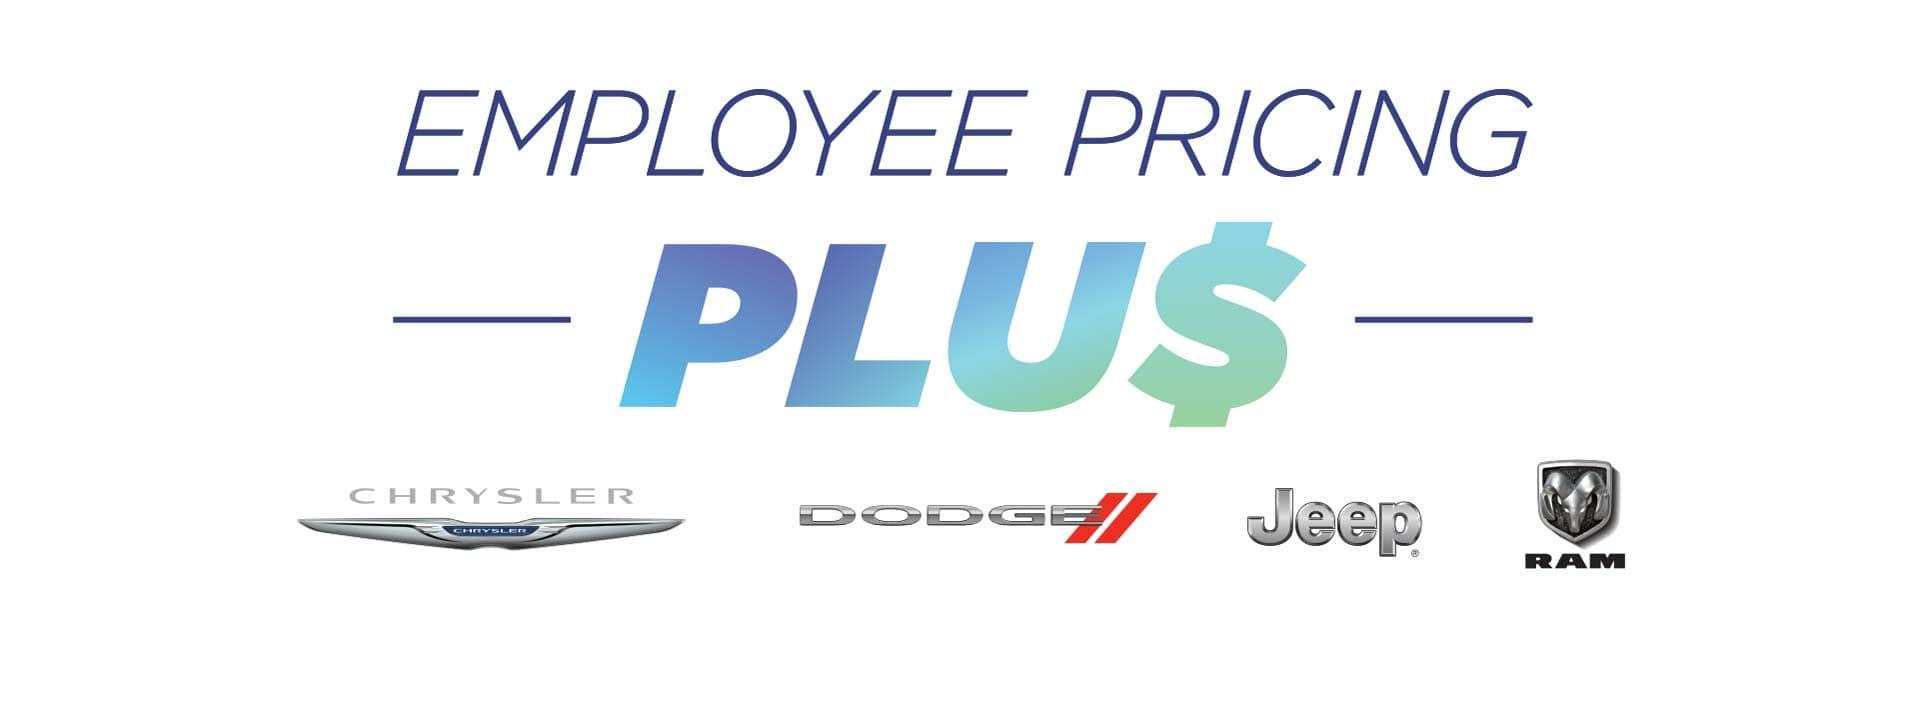 employee-pricing-plus-full